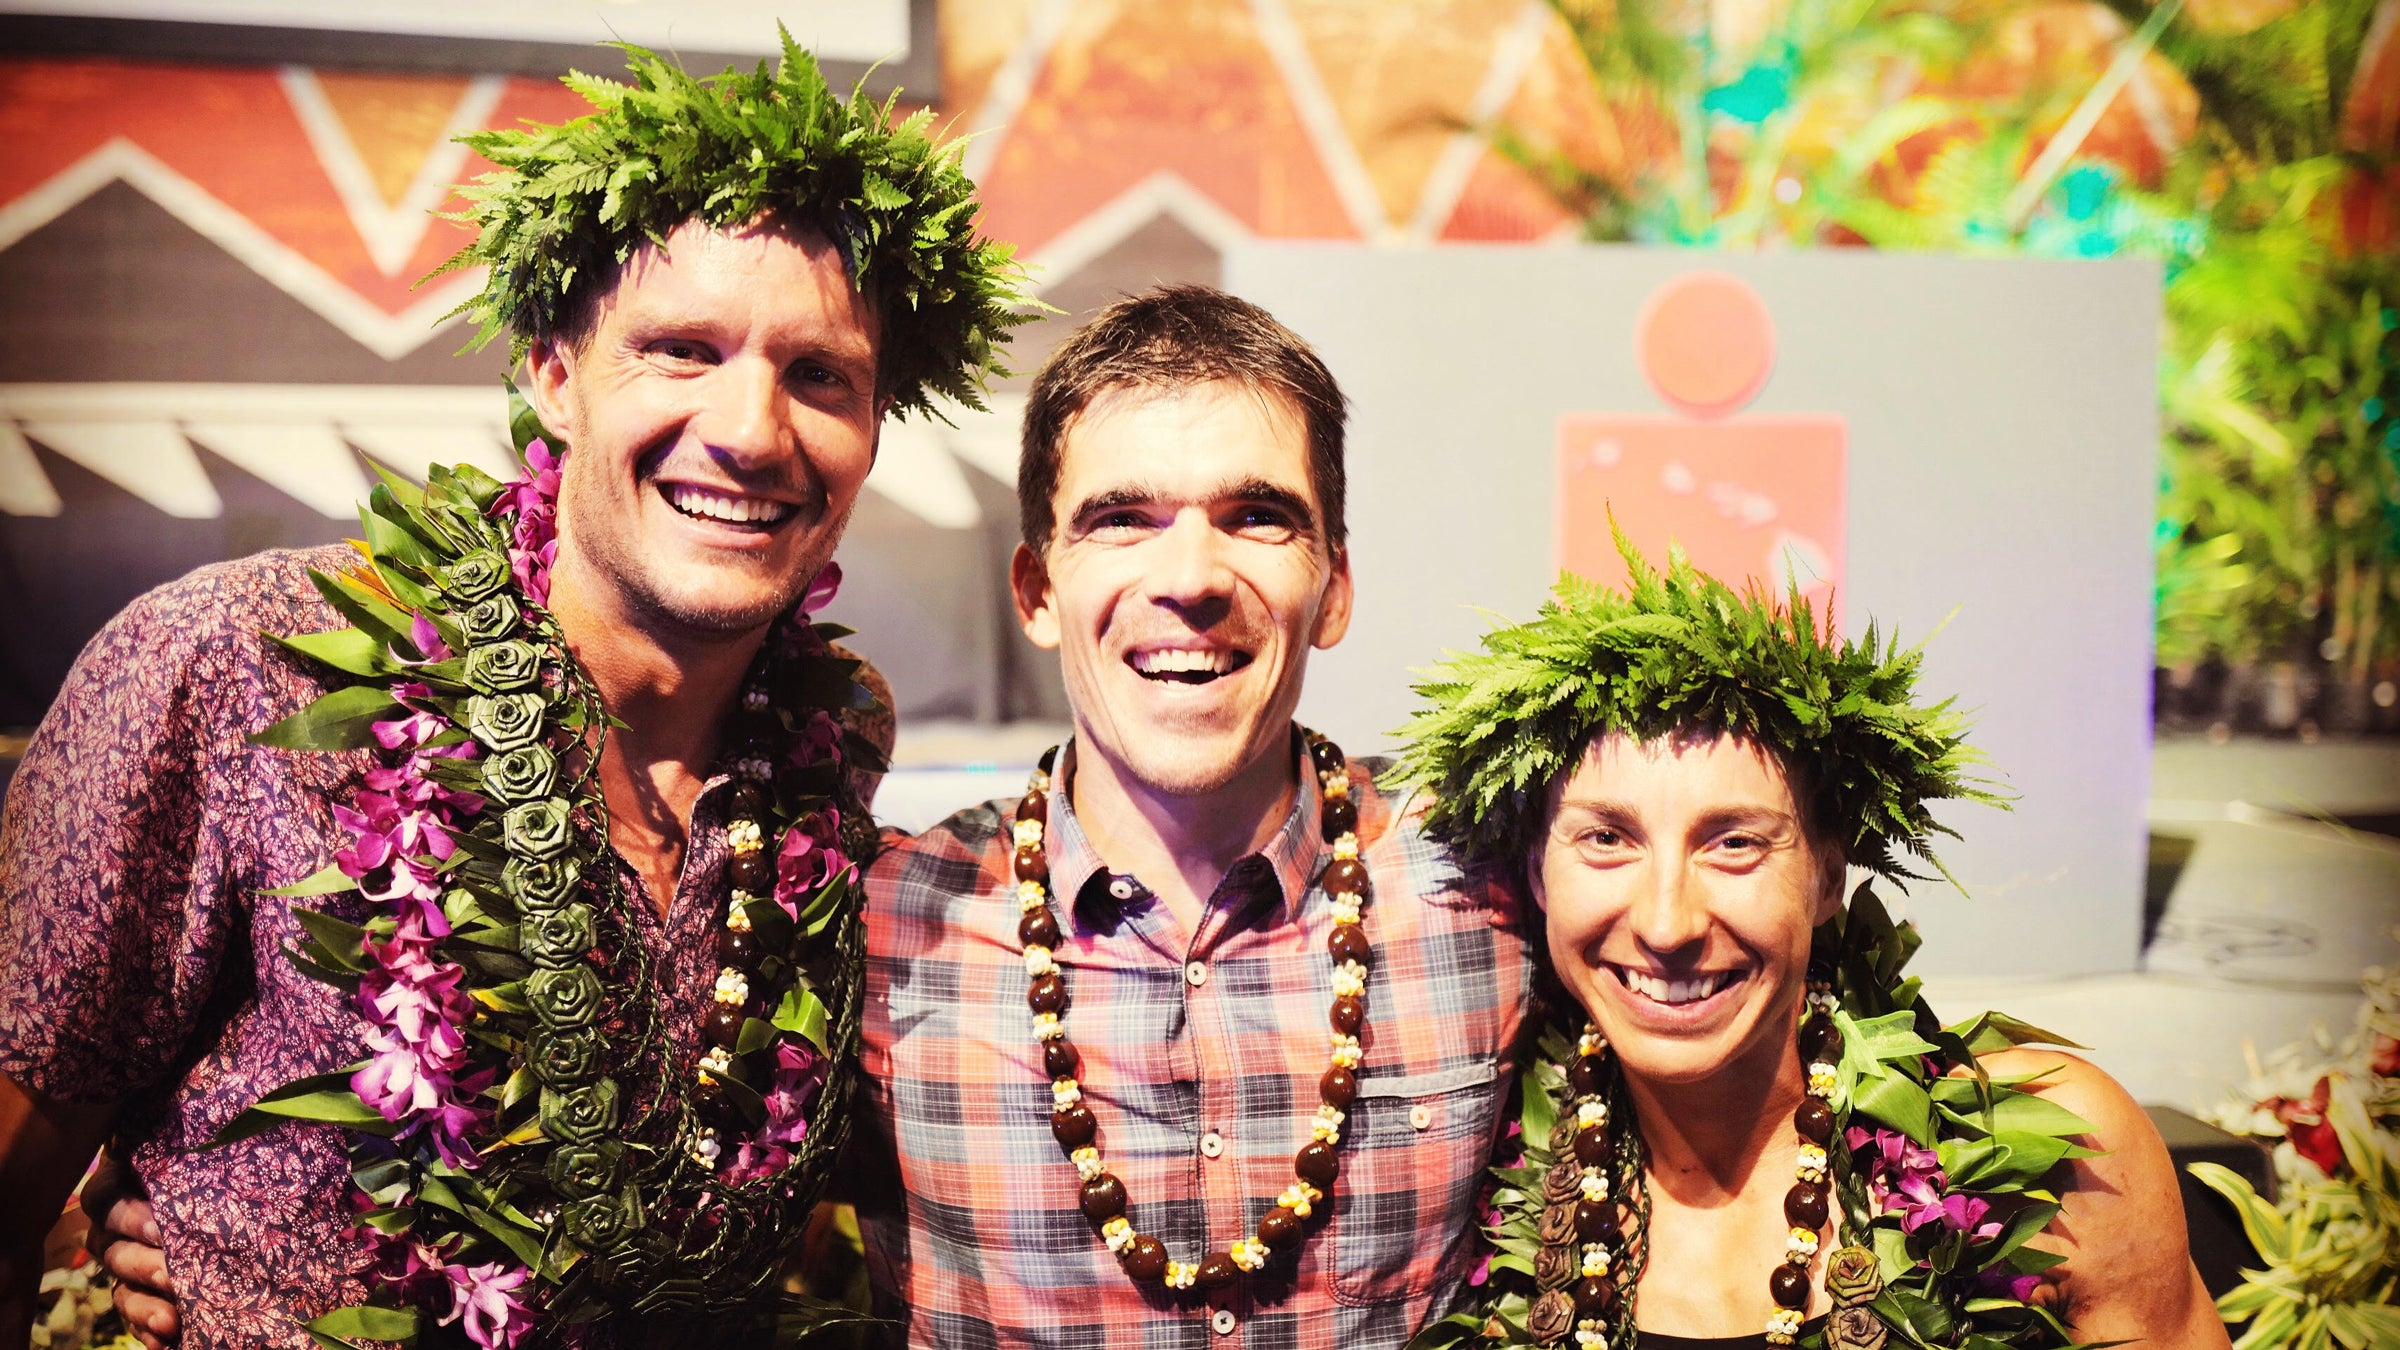 Meet The World's Best Long-Course Coach - Triathlete